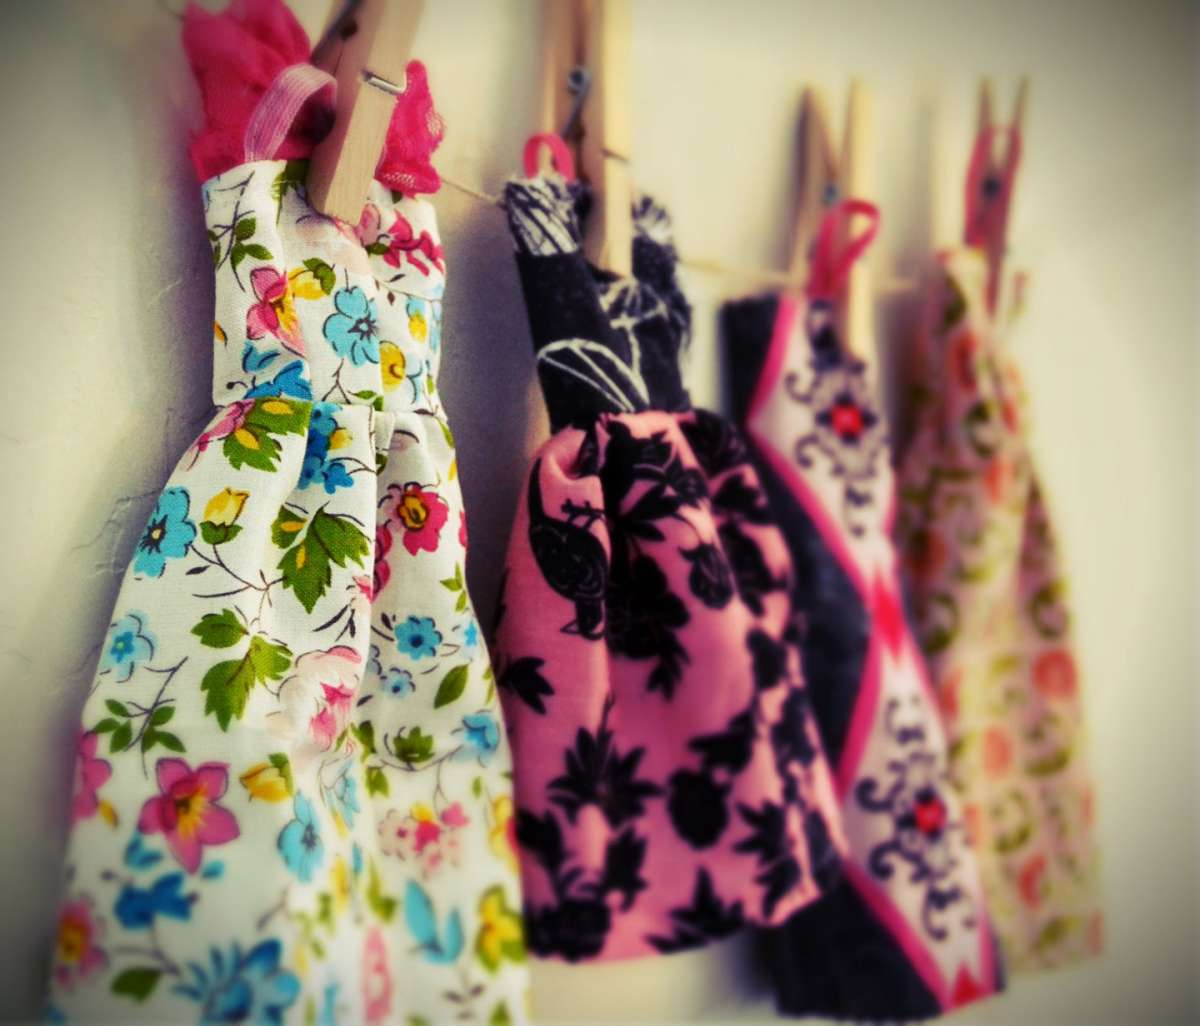 Vestiti per Barbie fai da te modelli e tutorial  FOTO  ... aee52166a96